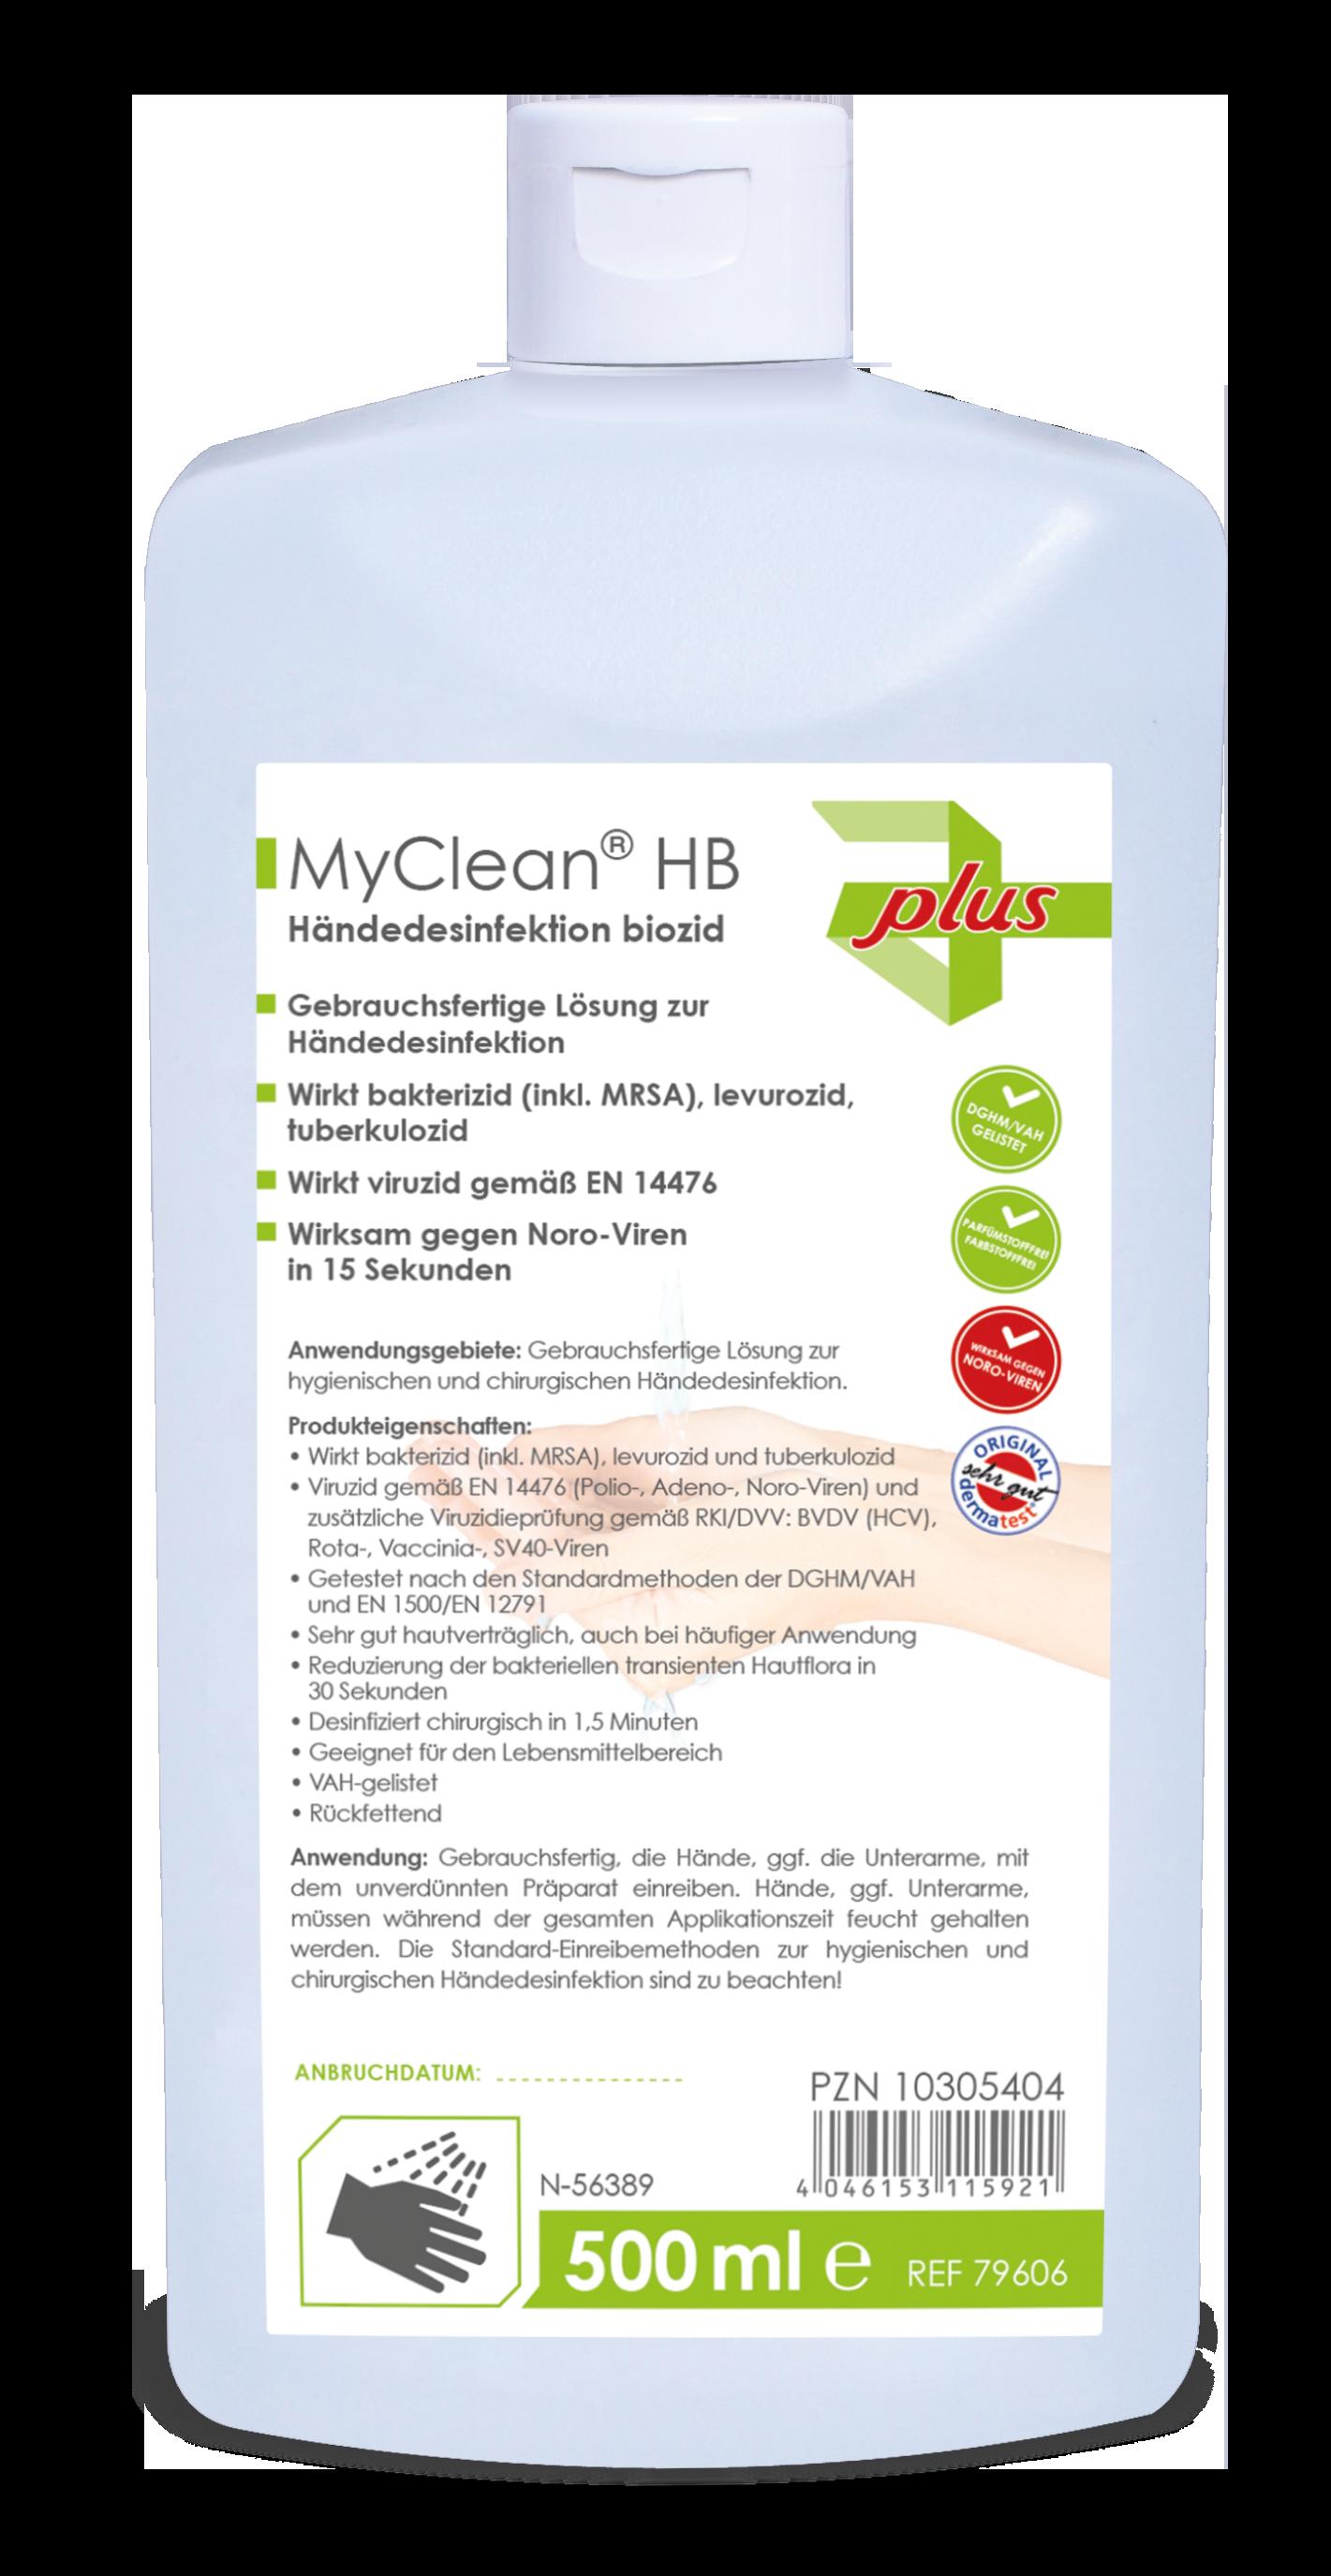 MaiMed® MyClean HB Händedesinfektion